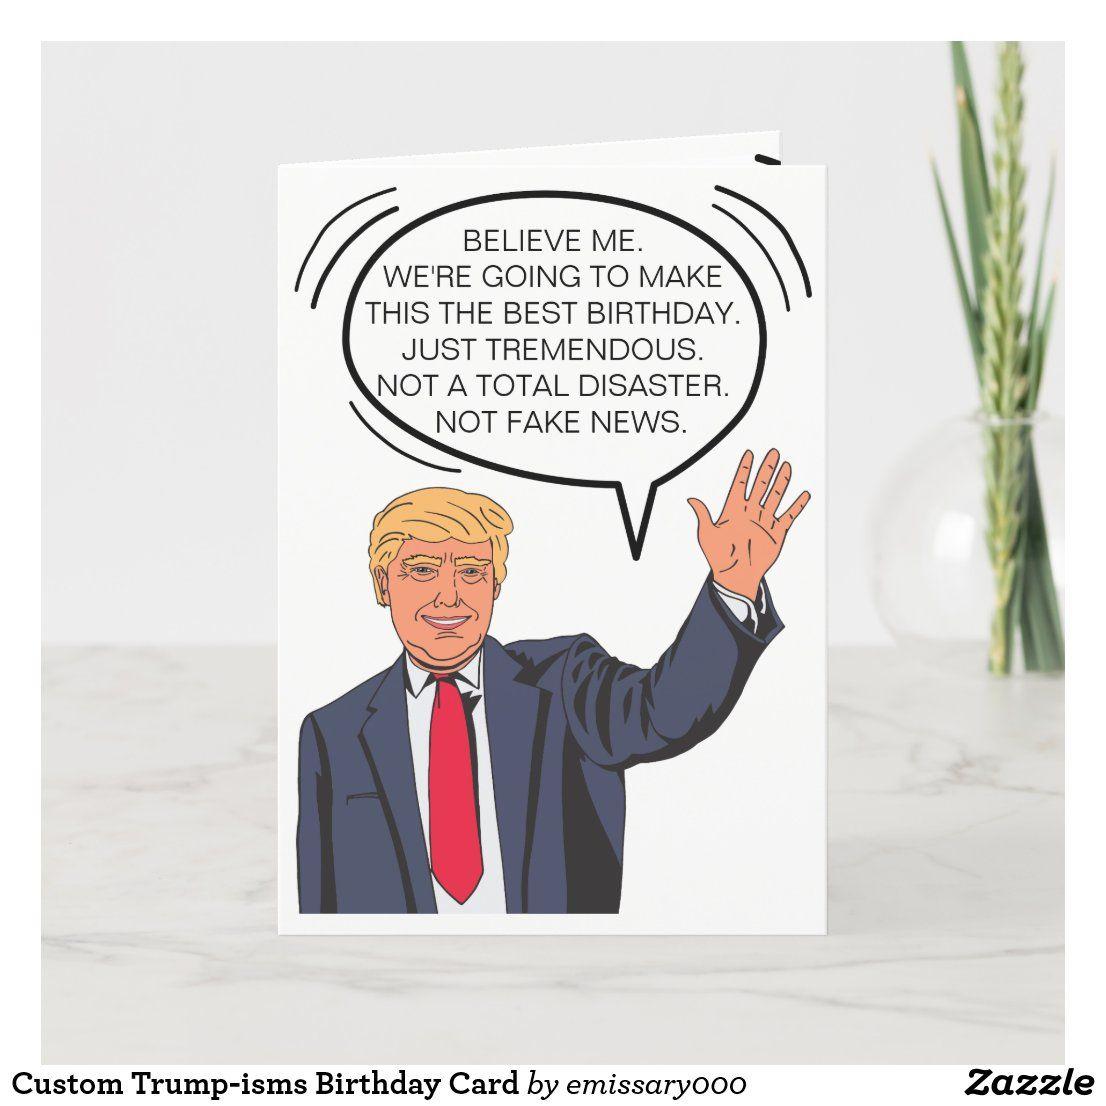 Funny Trumpisms Birthday Card Zazzle Com Trump Birthday Card Birthday Cards Funny Birthday Cards